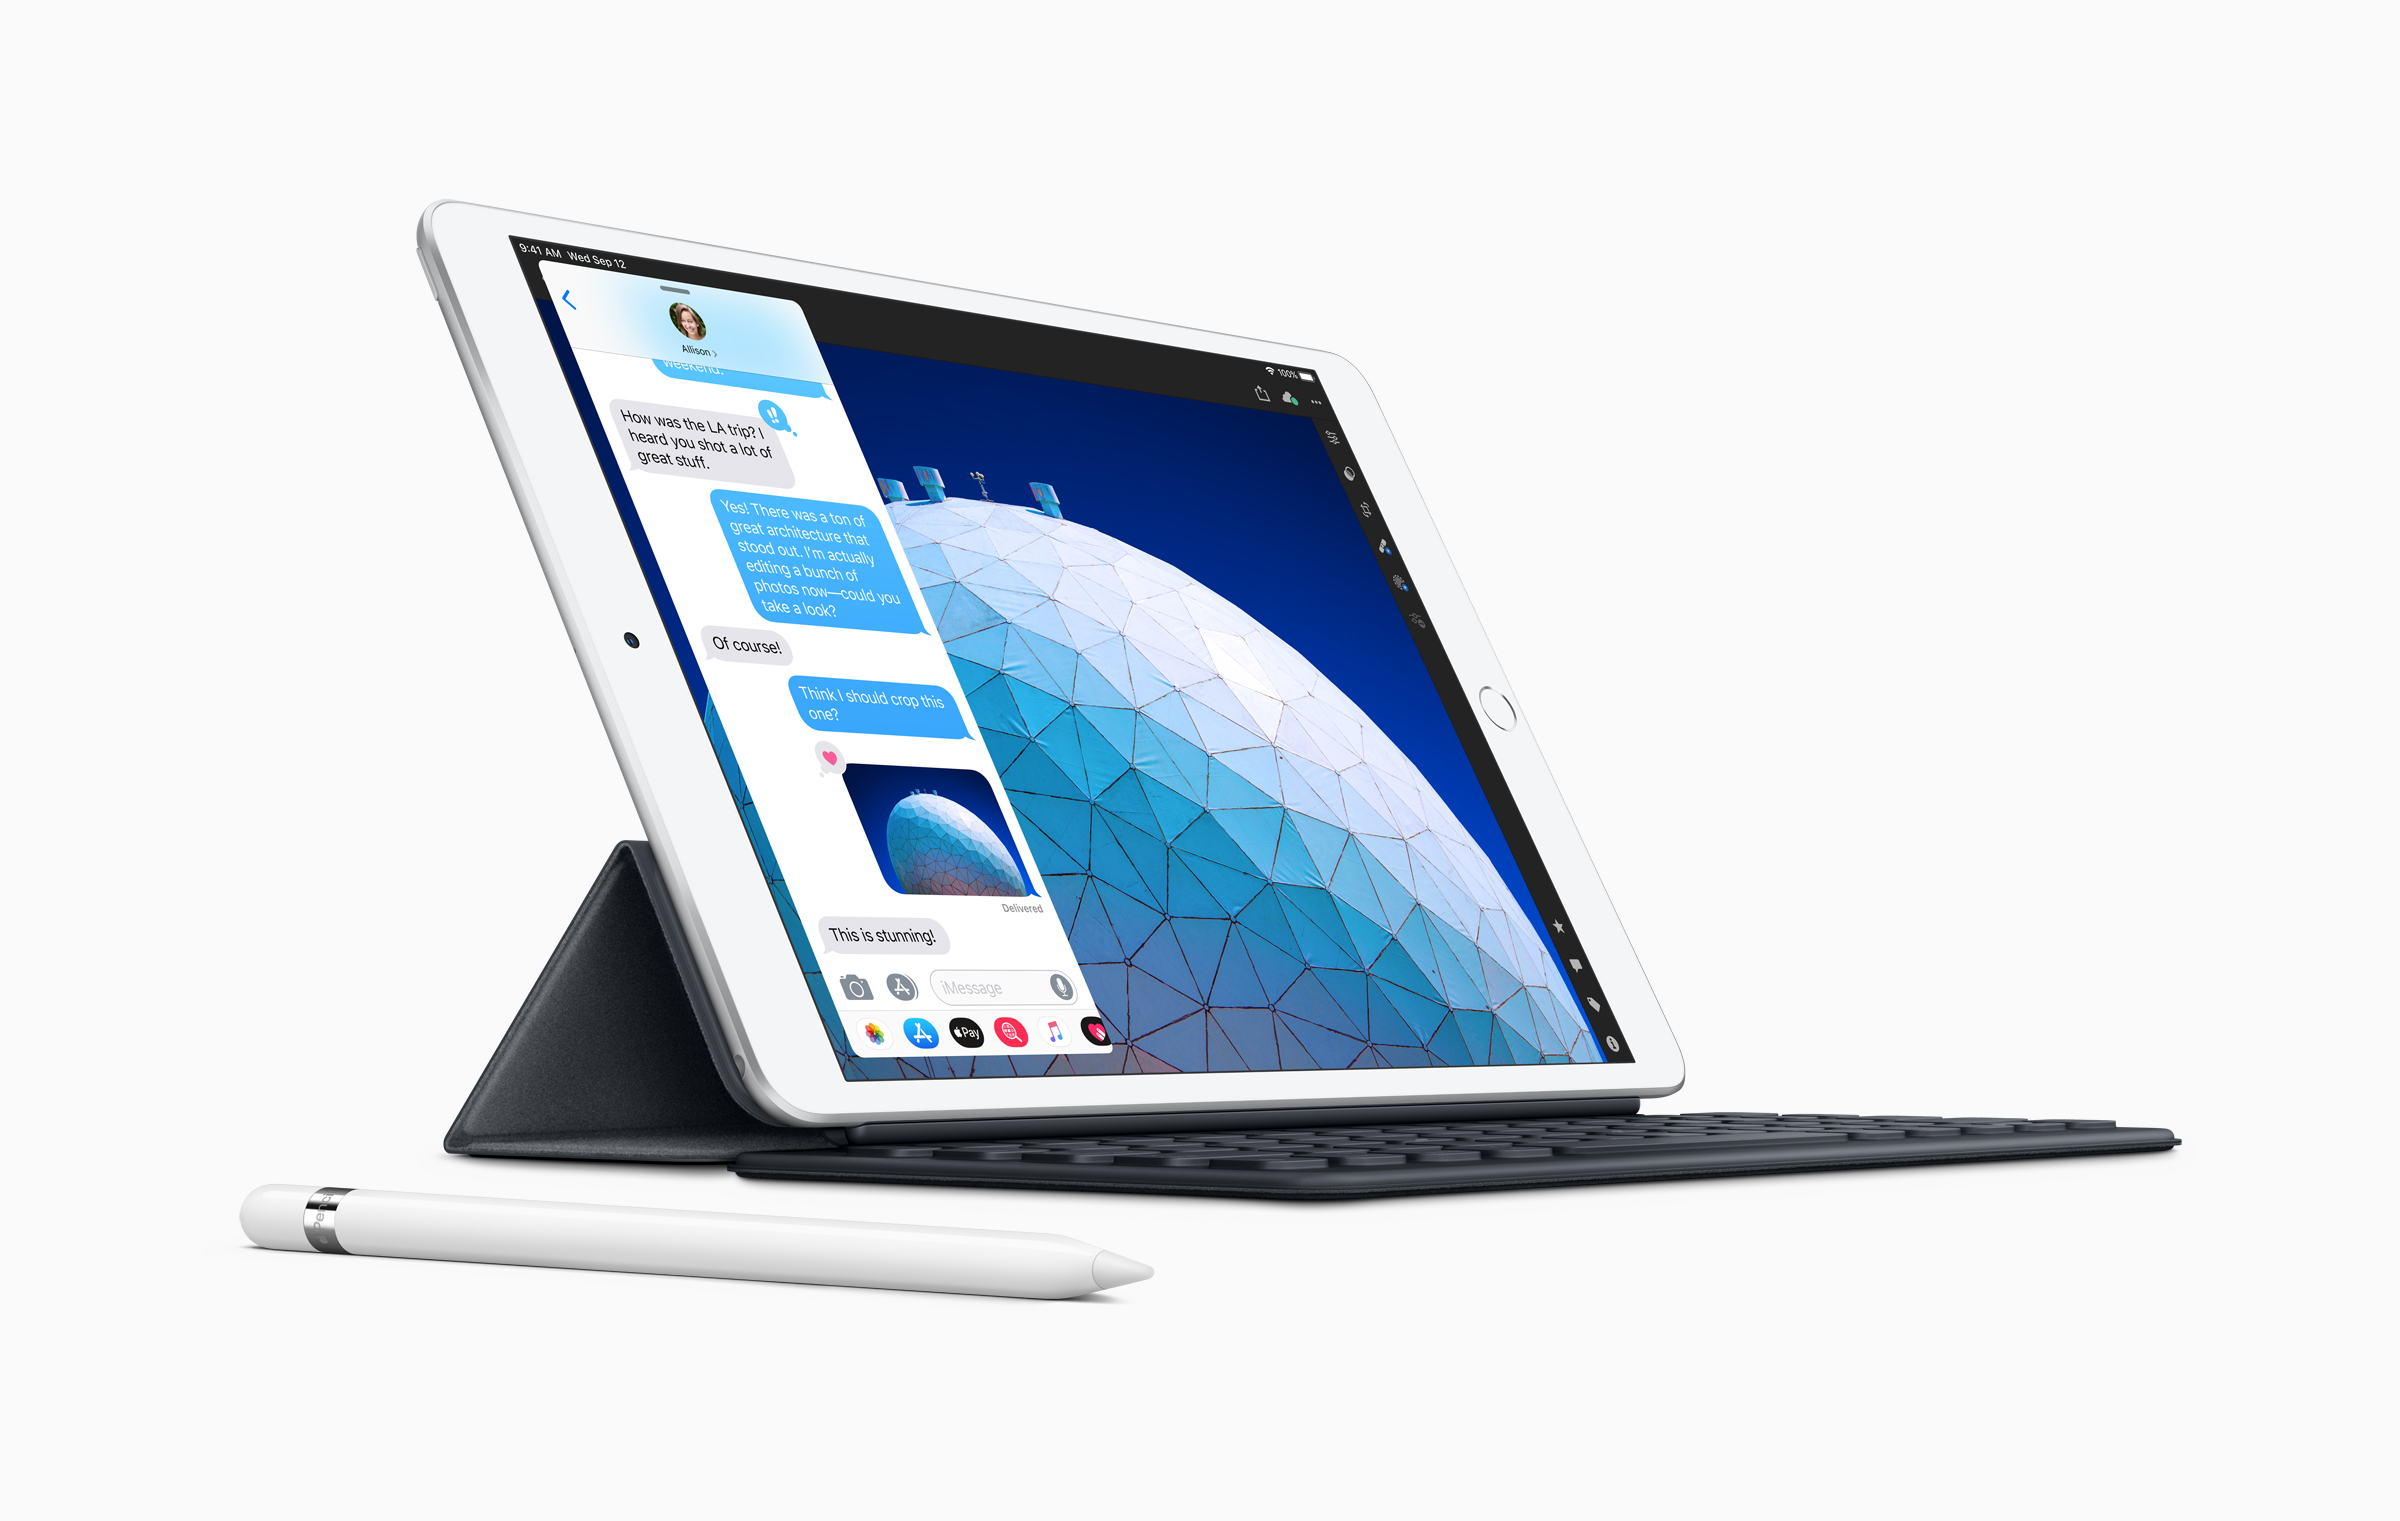 New-iPad-Air-smart-keyboard-with-apple-pencil-03192019.jpg